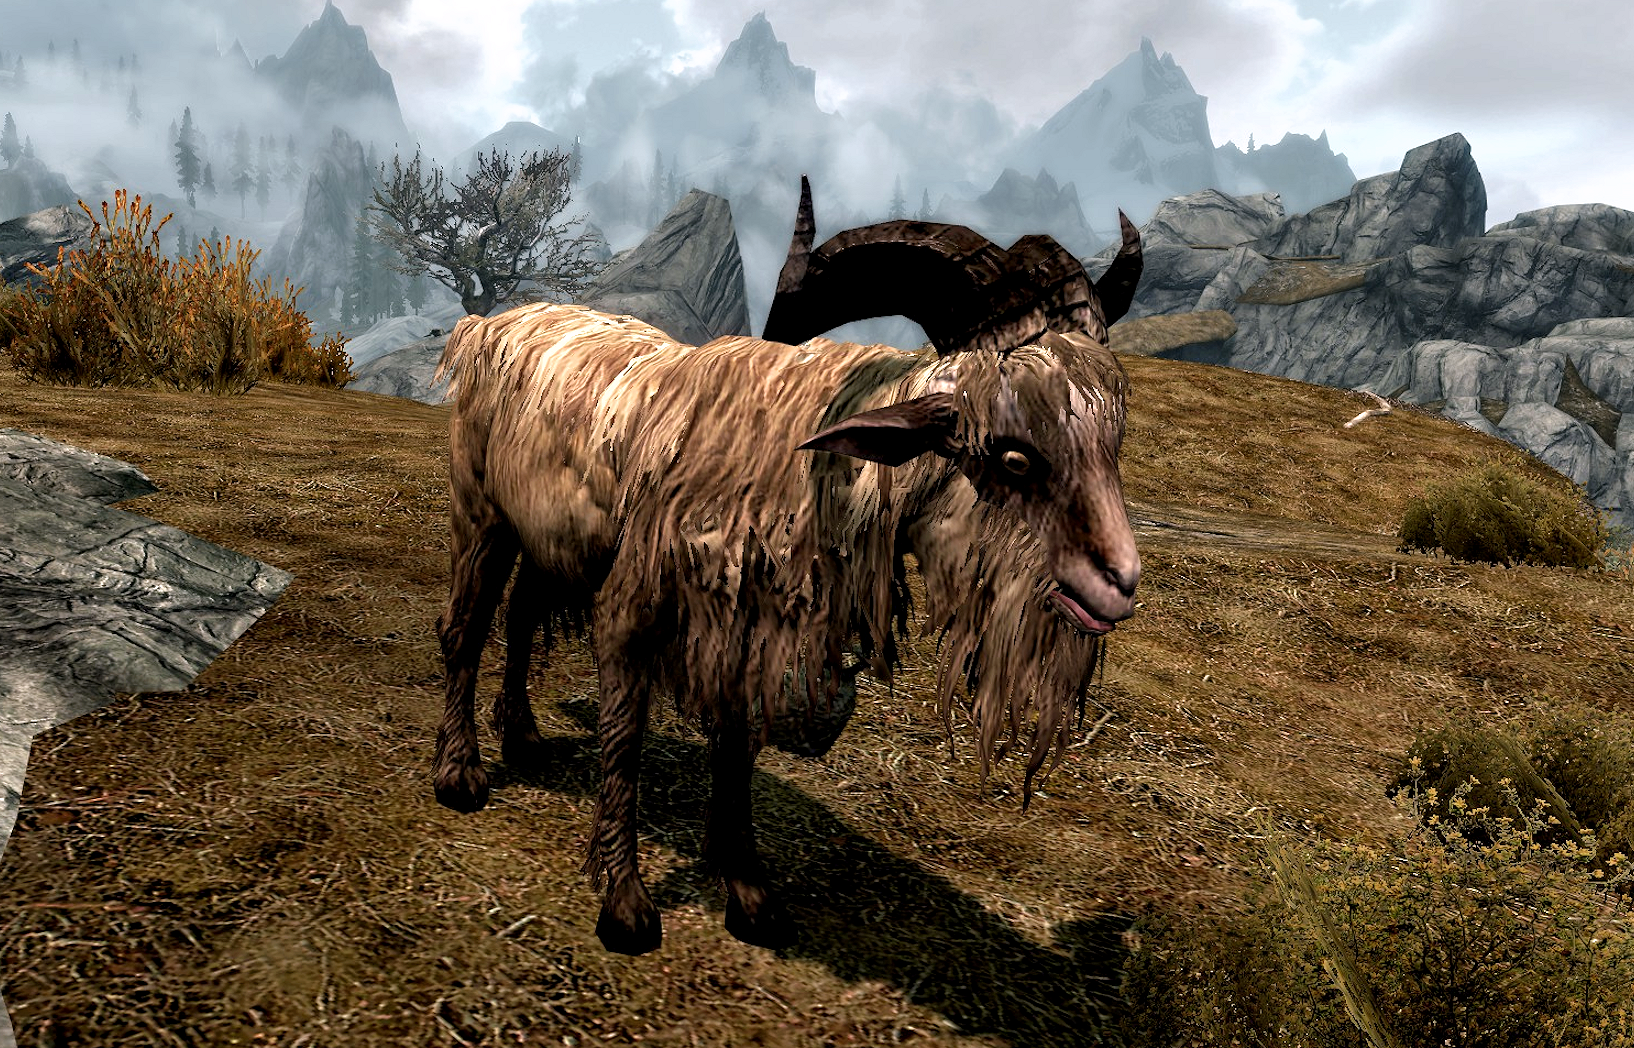 Gleda the Goat